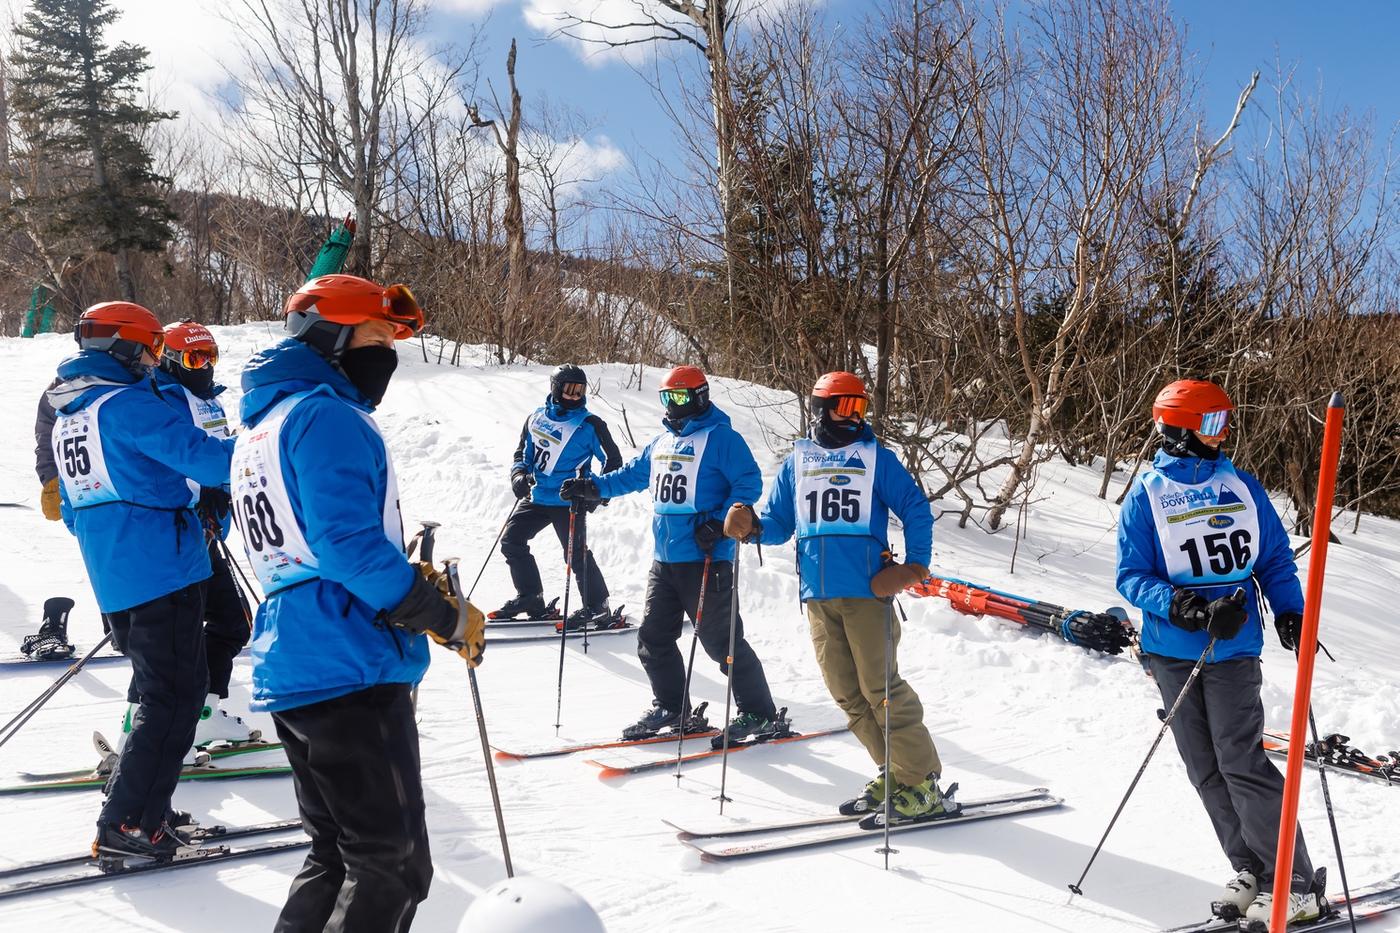 WinterKids Downhill 24 2021 SDP 3341